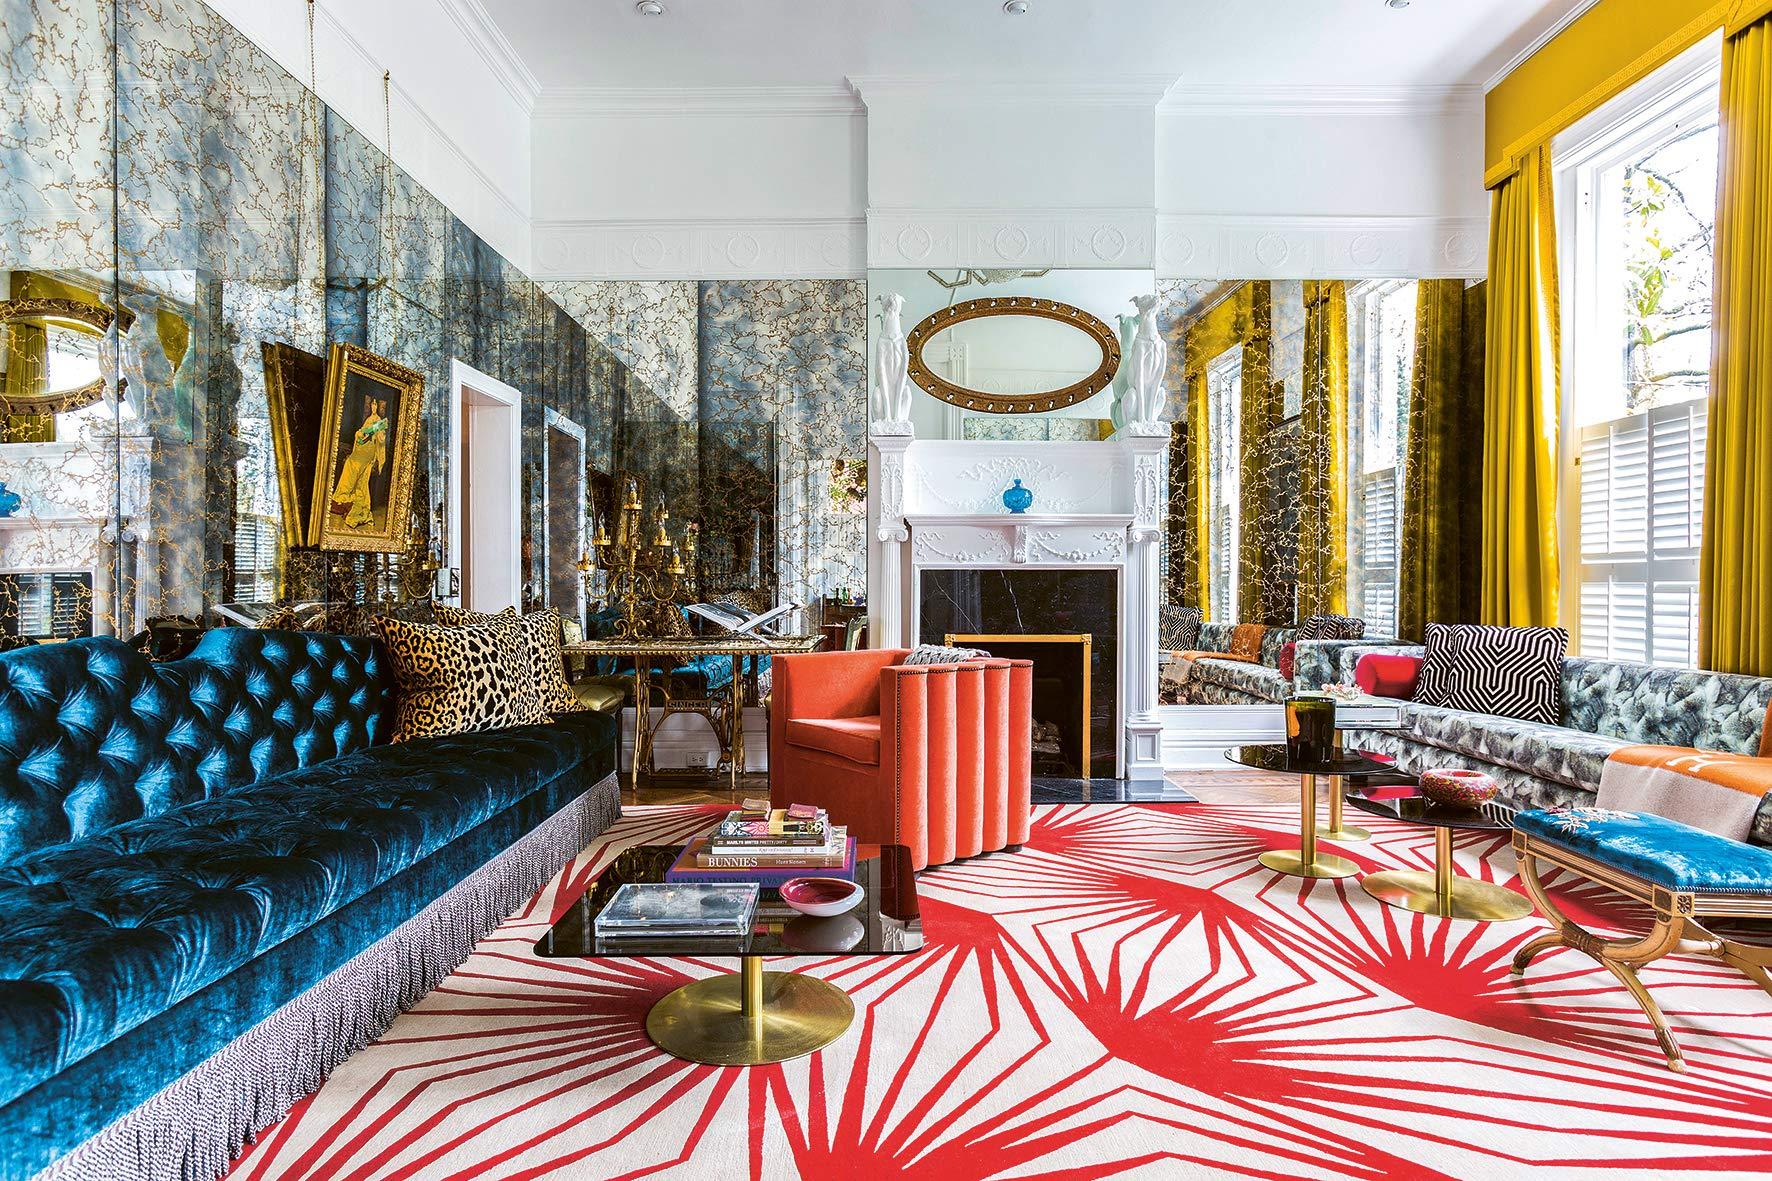 Decorative Art In Modern Interiors Vol 59